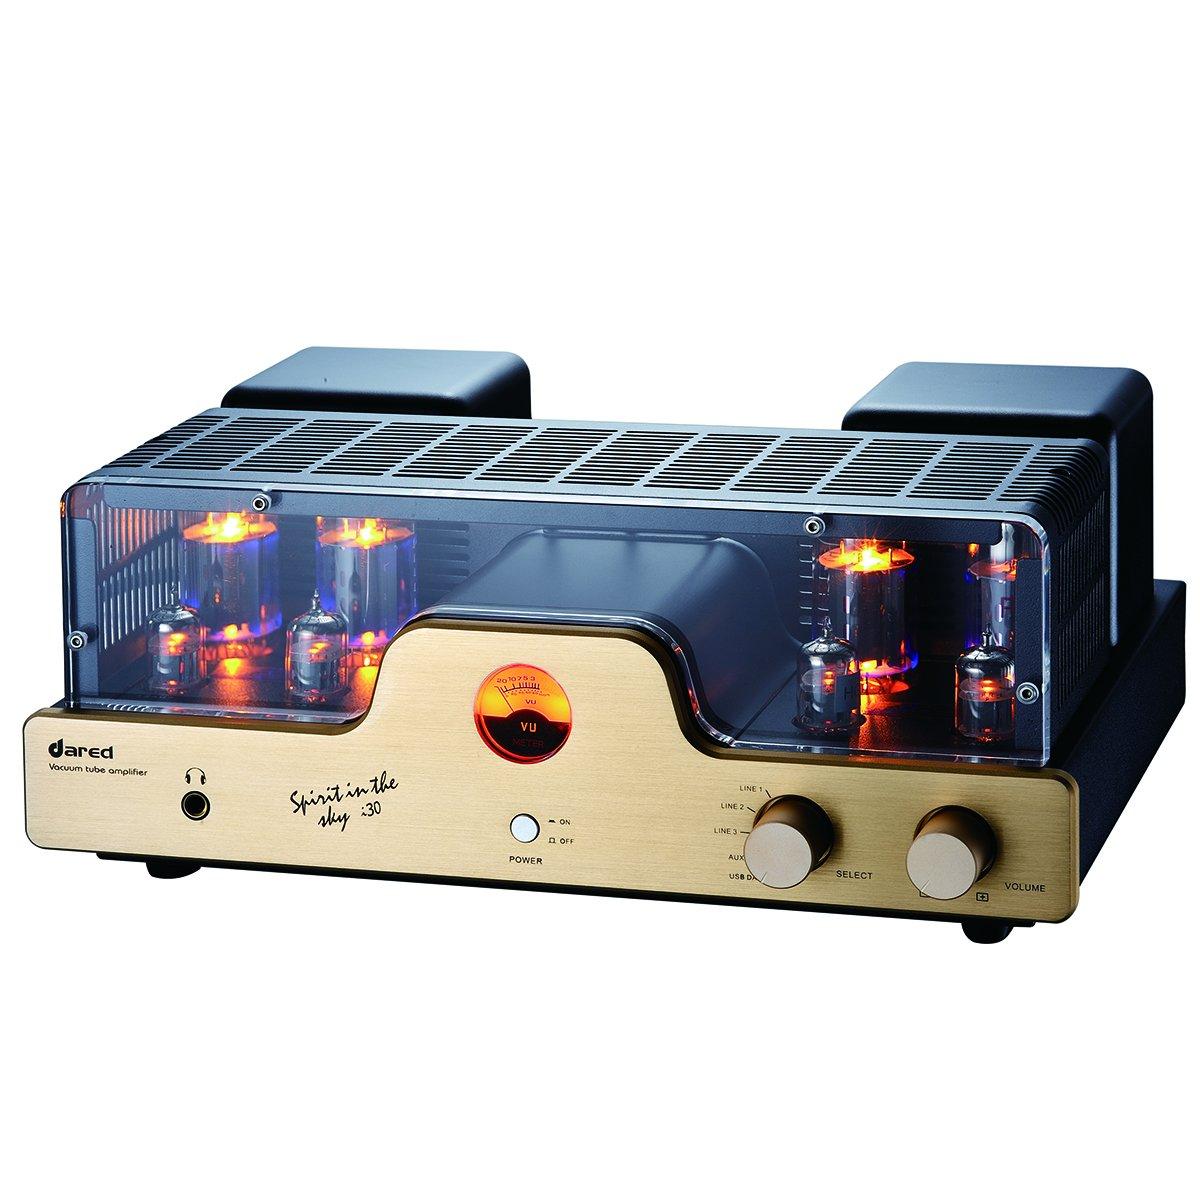 Dared I30 HIFI Audiophiles Professional Class A Vacuum Tube Integrated Amplifier USB-DAC/LINE input and Headphone Output,30W*2,with 6L6G(5881),12AX7(ECC83),12AU7(ECC82) Tube